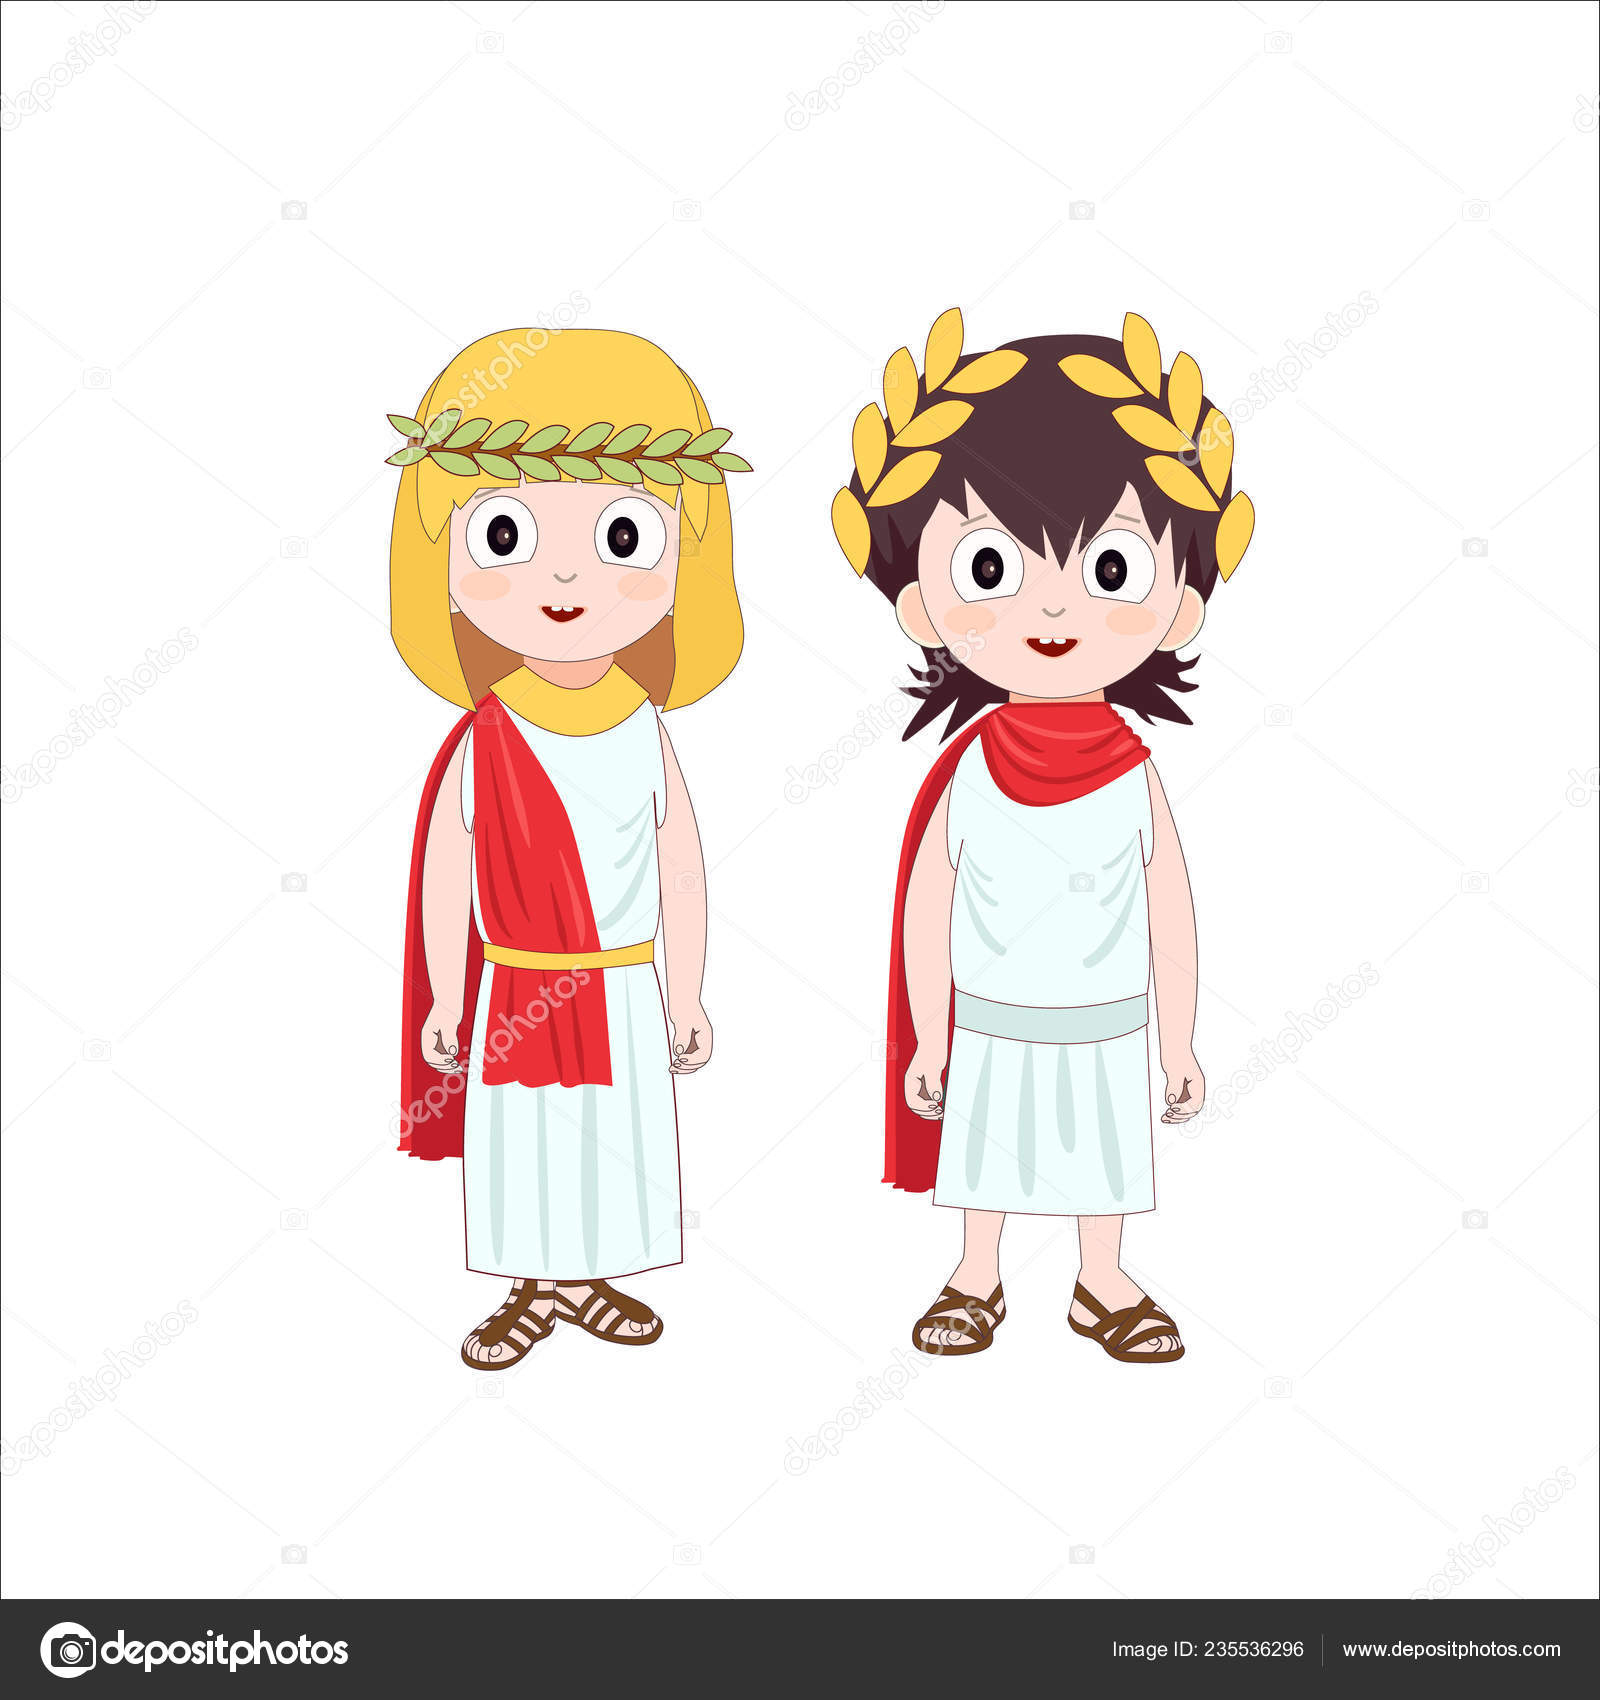 Antigos Personagens Desenhos Animados Roma Menino Menina